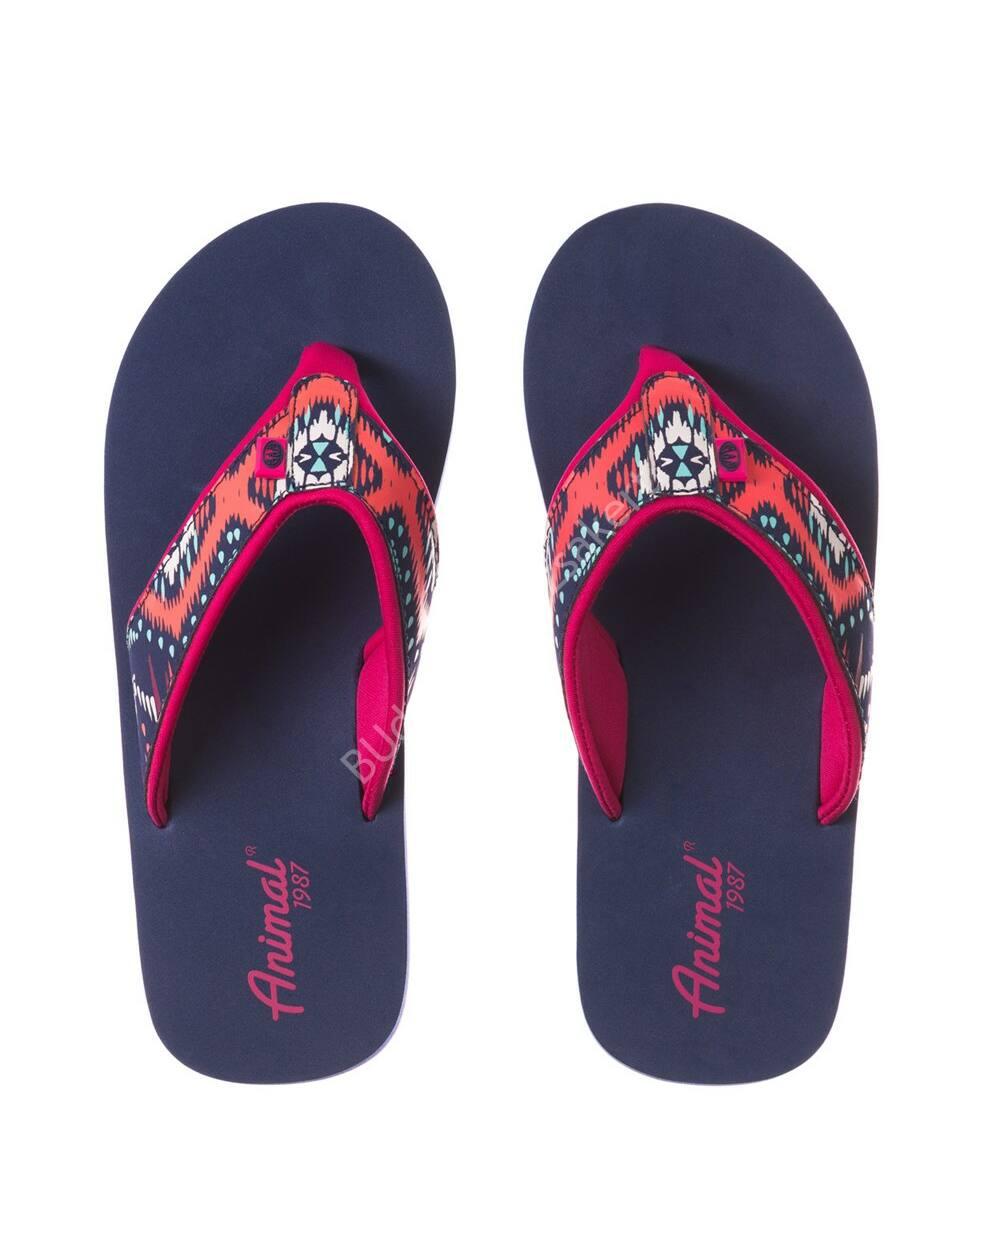 Animal Swish flip-flop papucs nőknek, lila